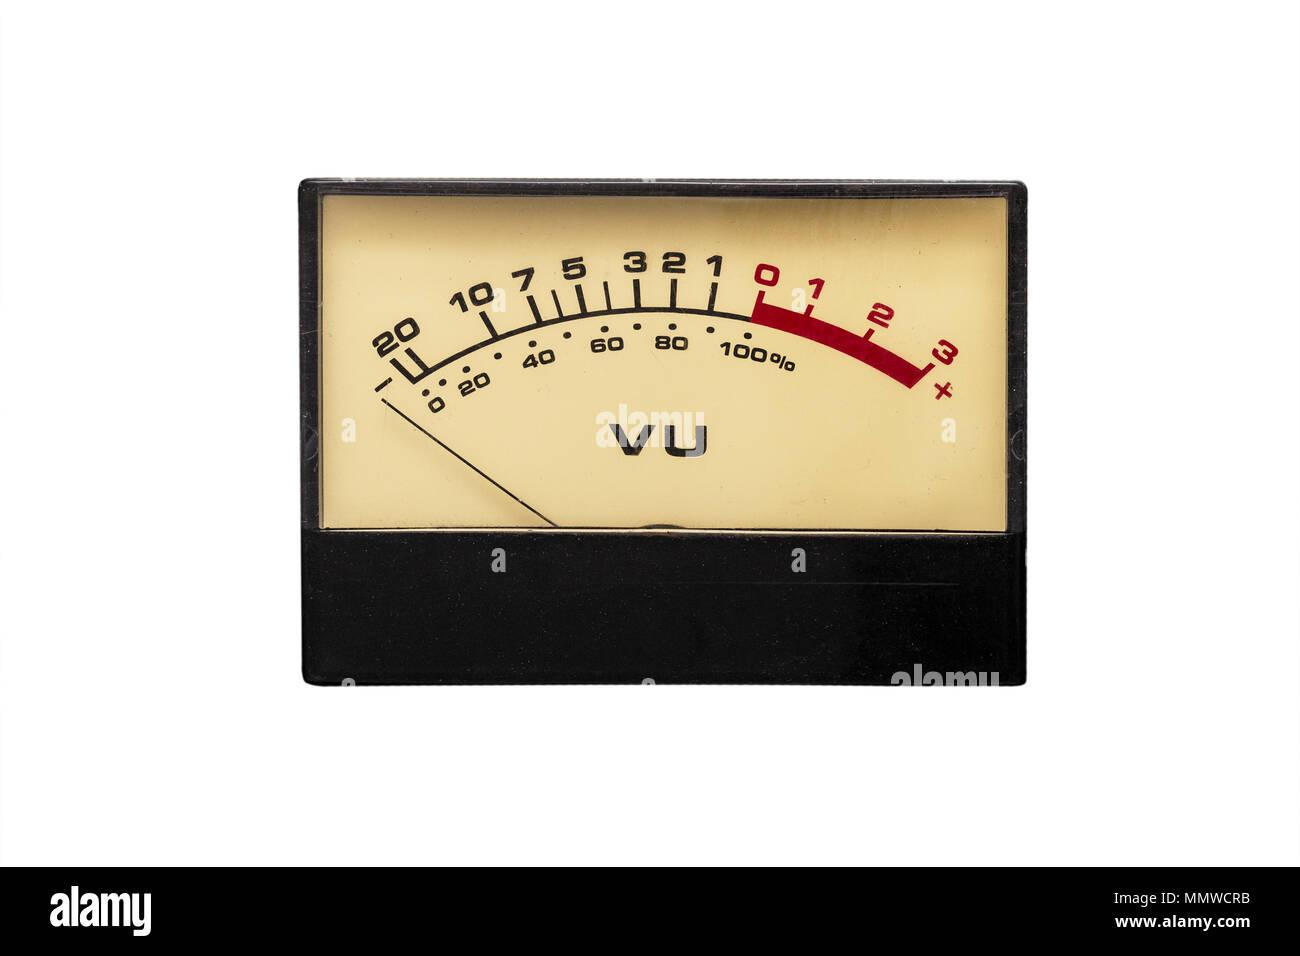 Old analog Dial vu indicator - Stock Image